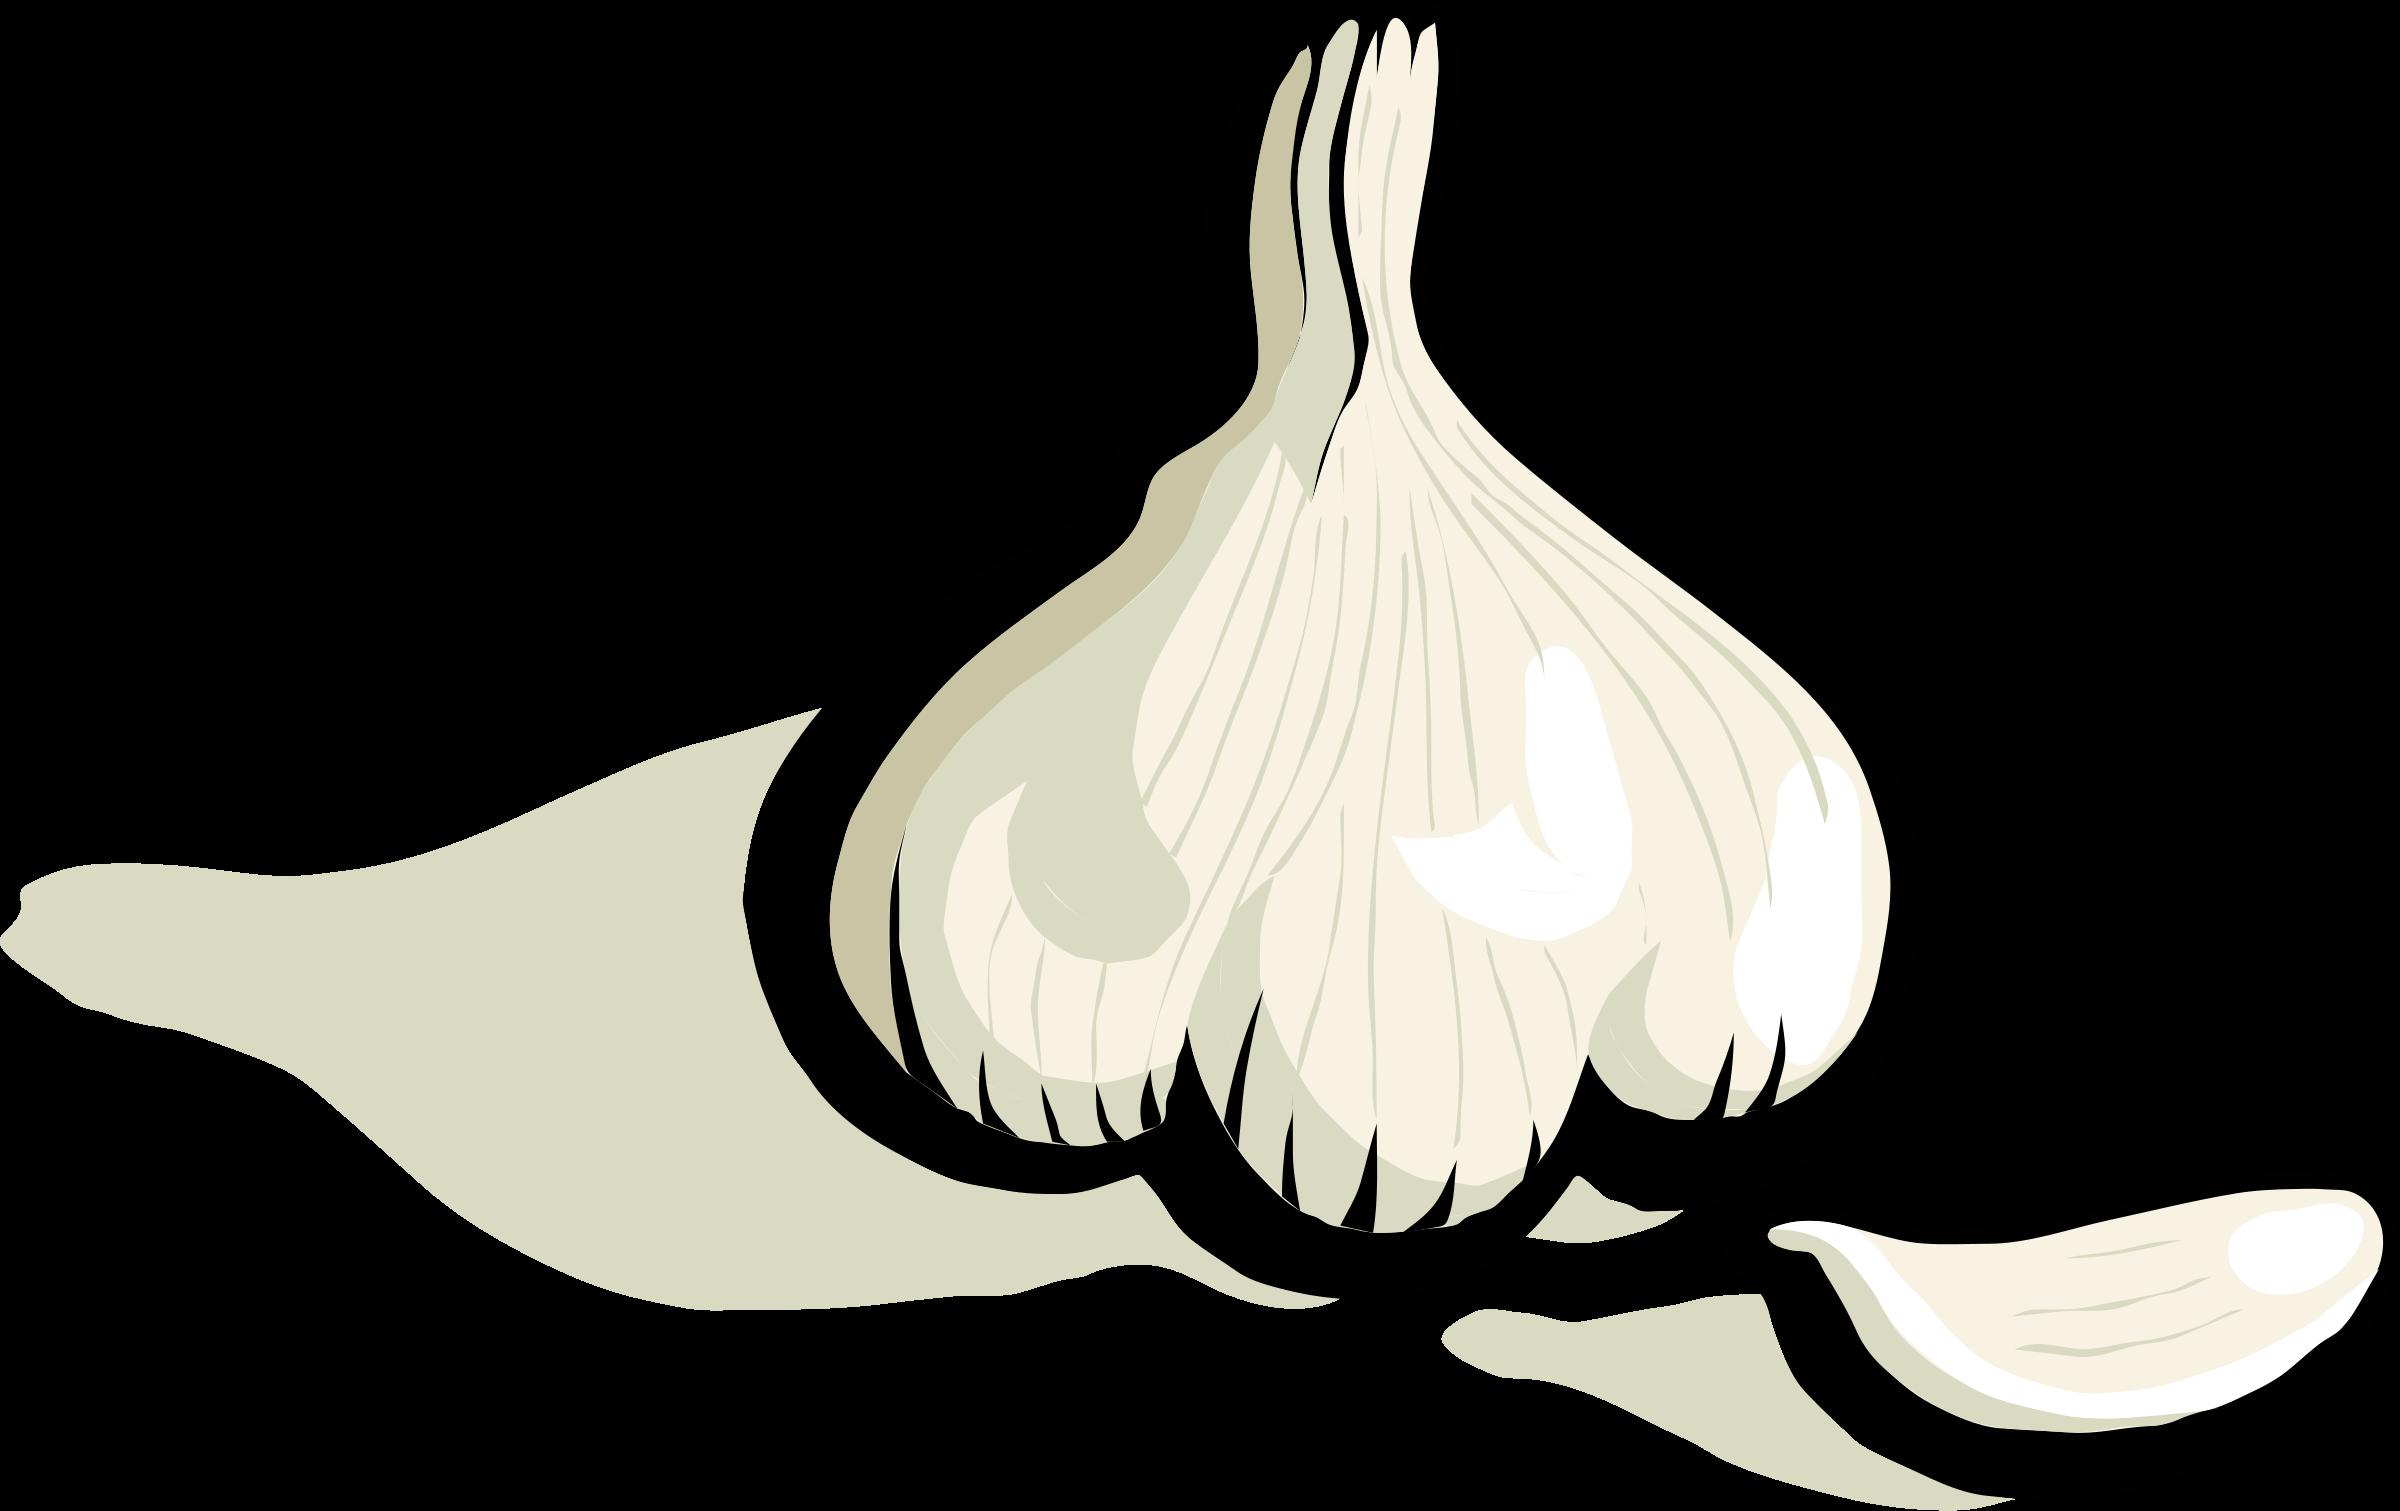 Garlic 20clipart.